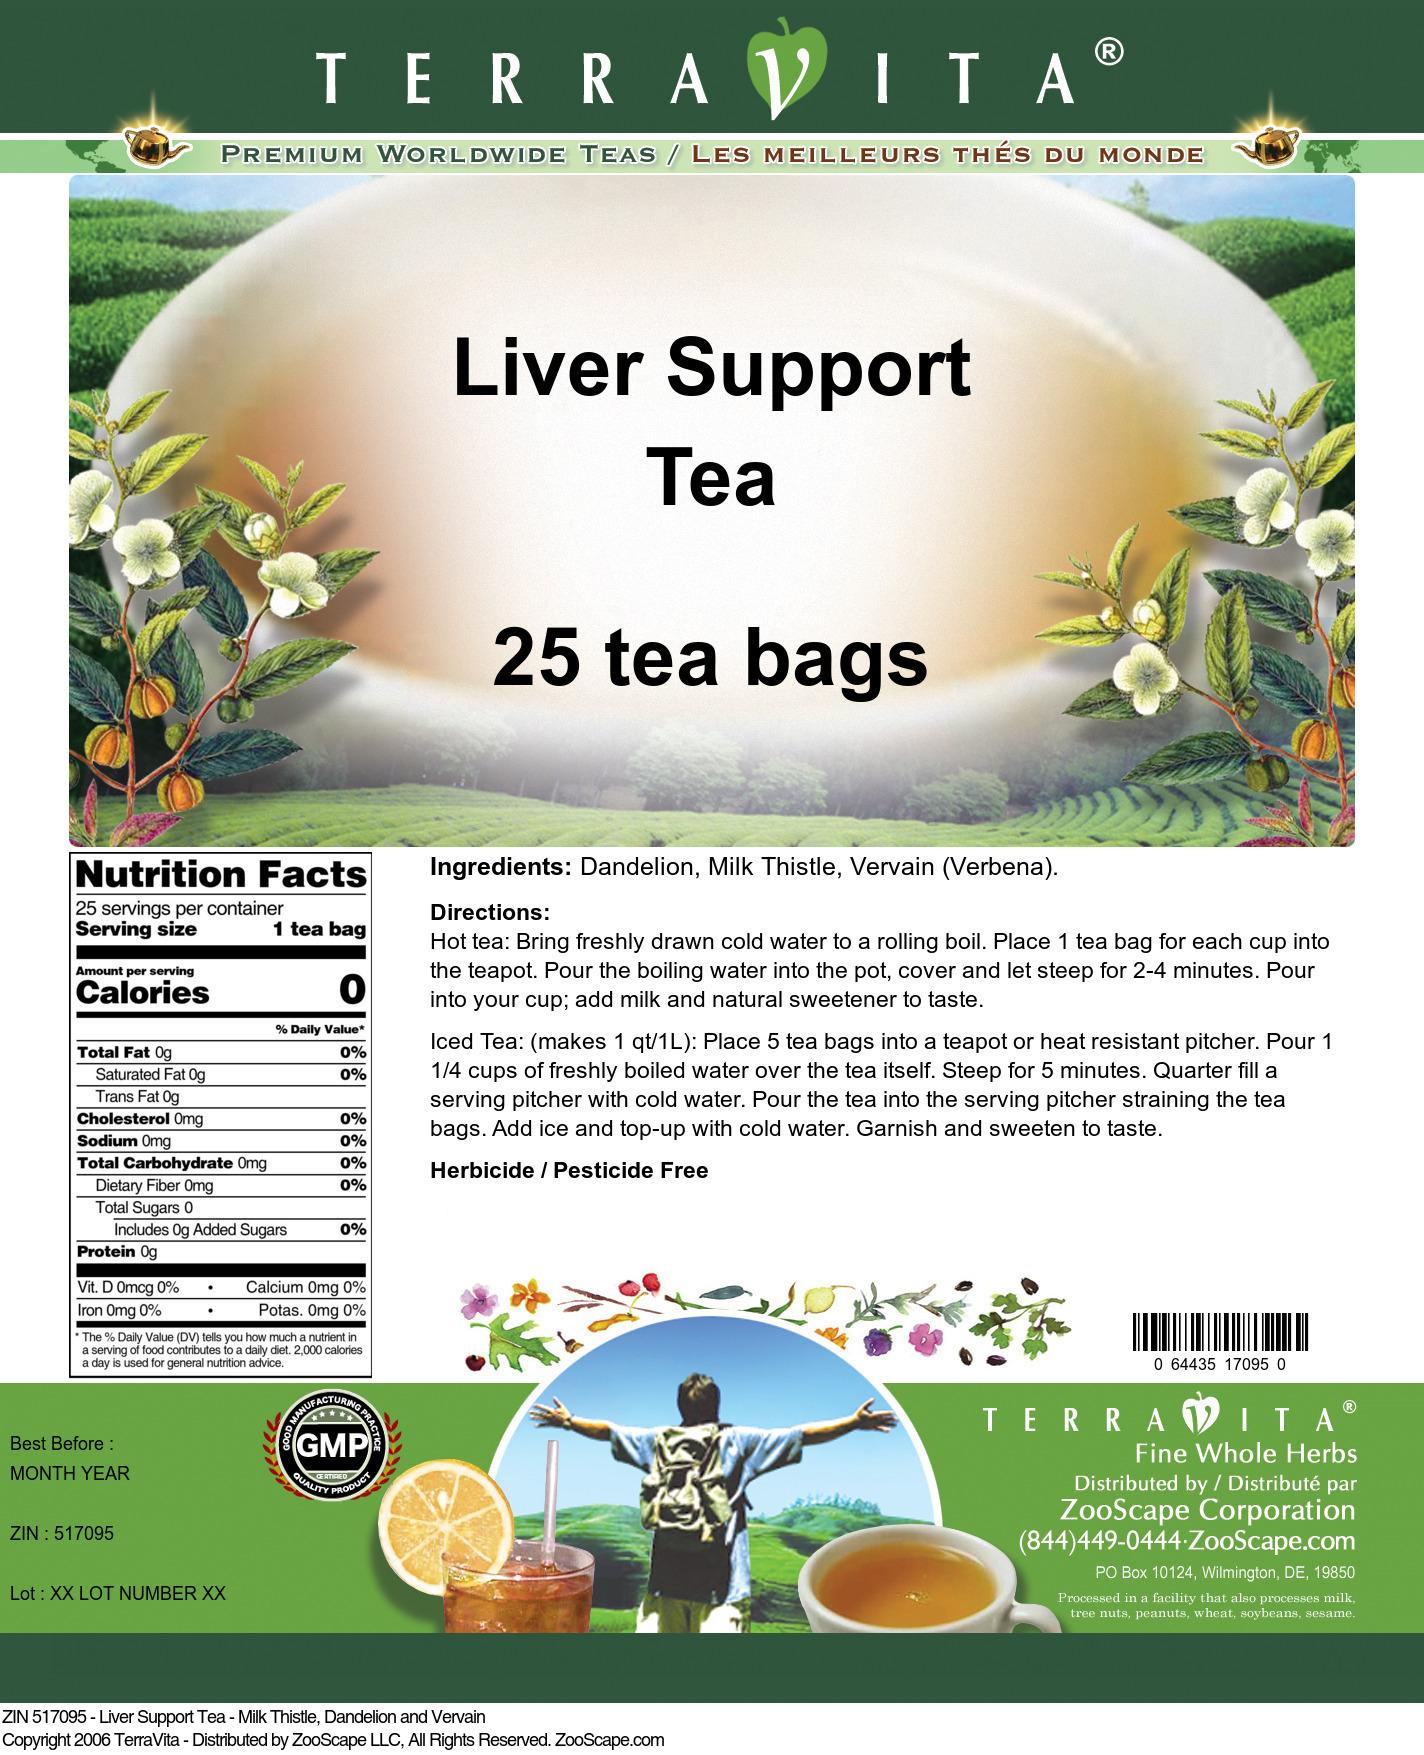 Liver Support Tea - Milk Thistle, Dandelion and Vervain